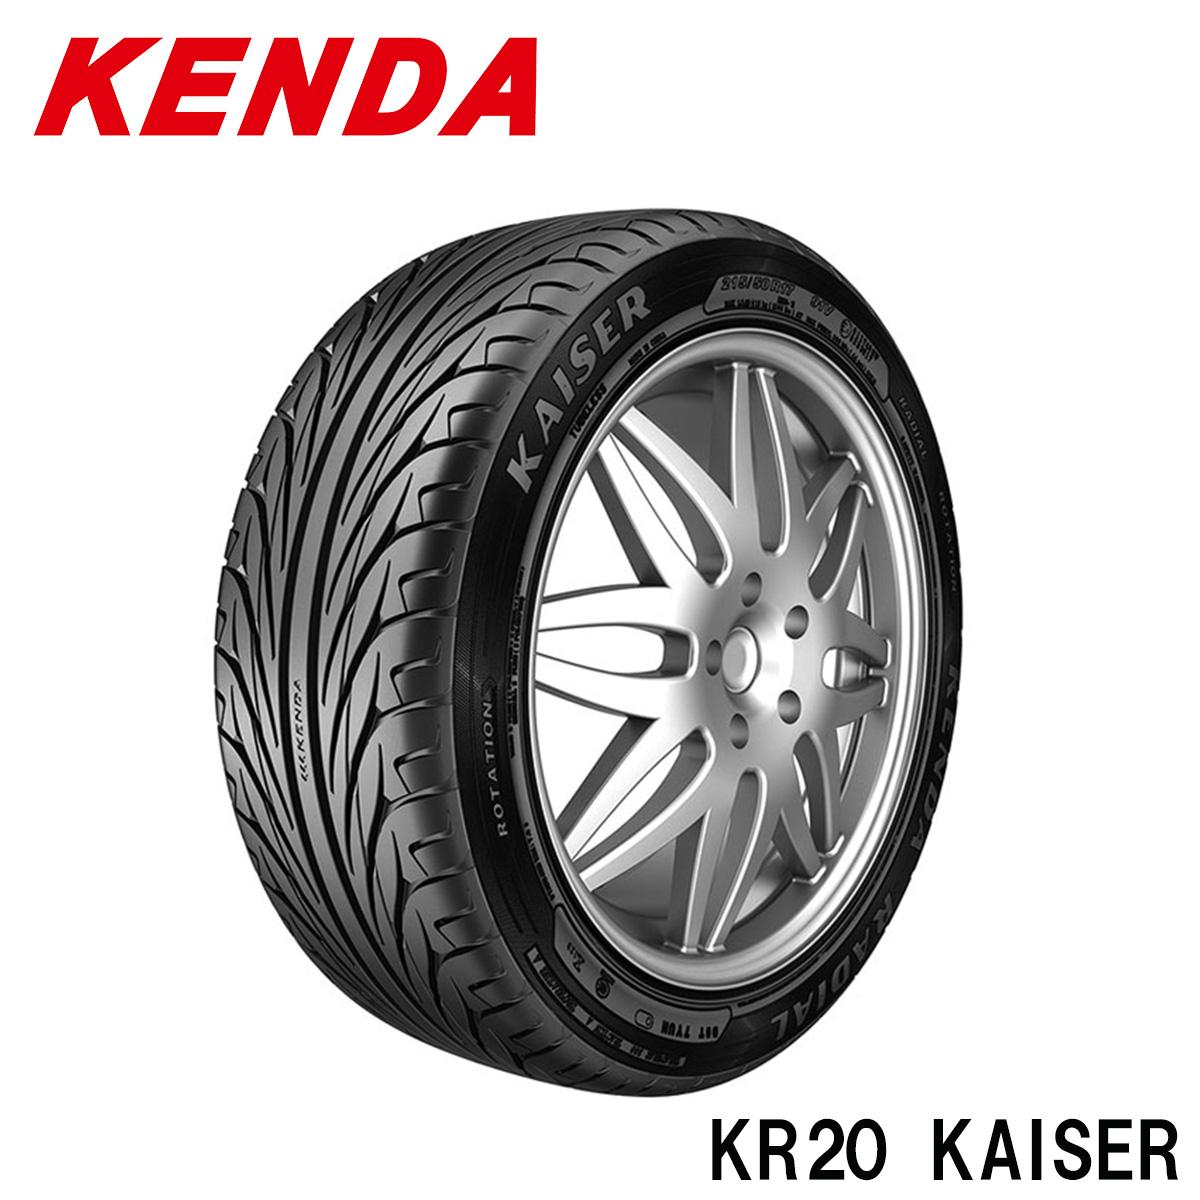 KENDA ケンダ サマータイヤ 4本 セット 19インチ 235/35R19 カイザー KAISER KR20